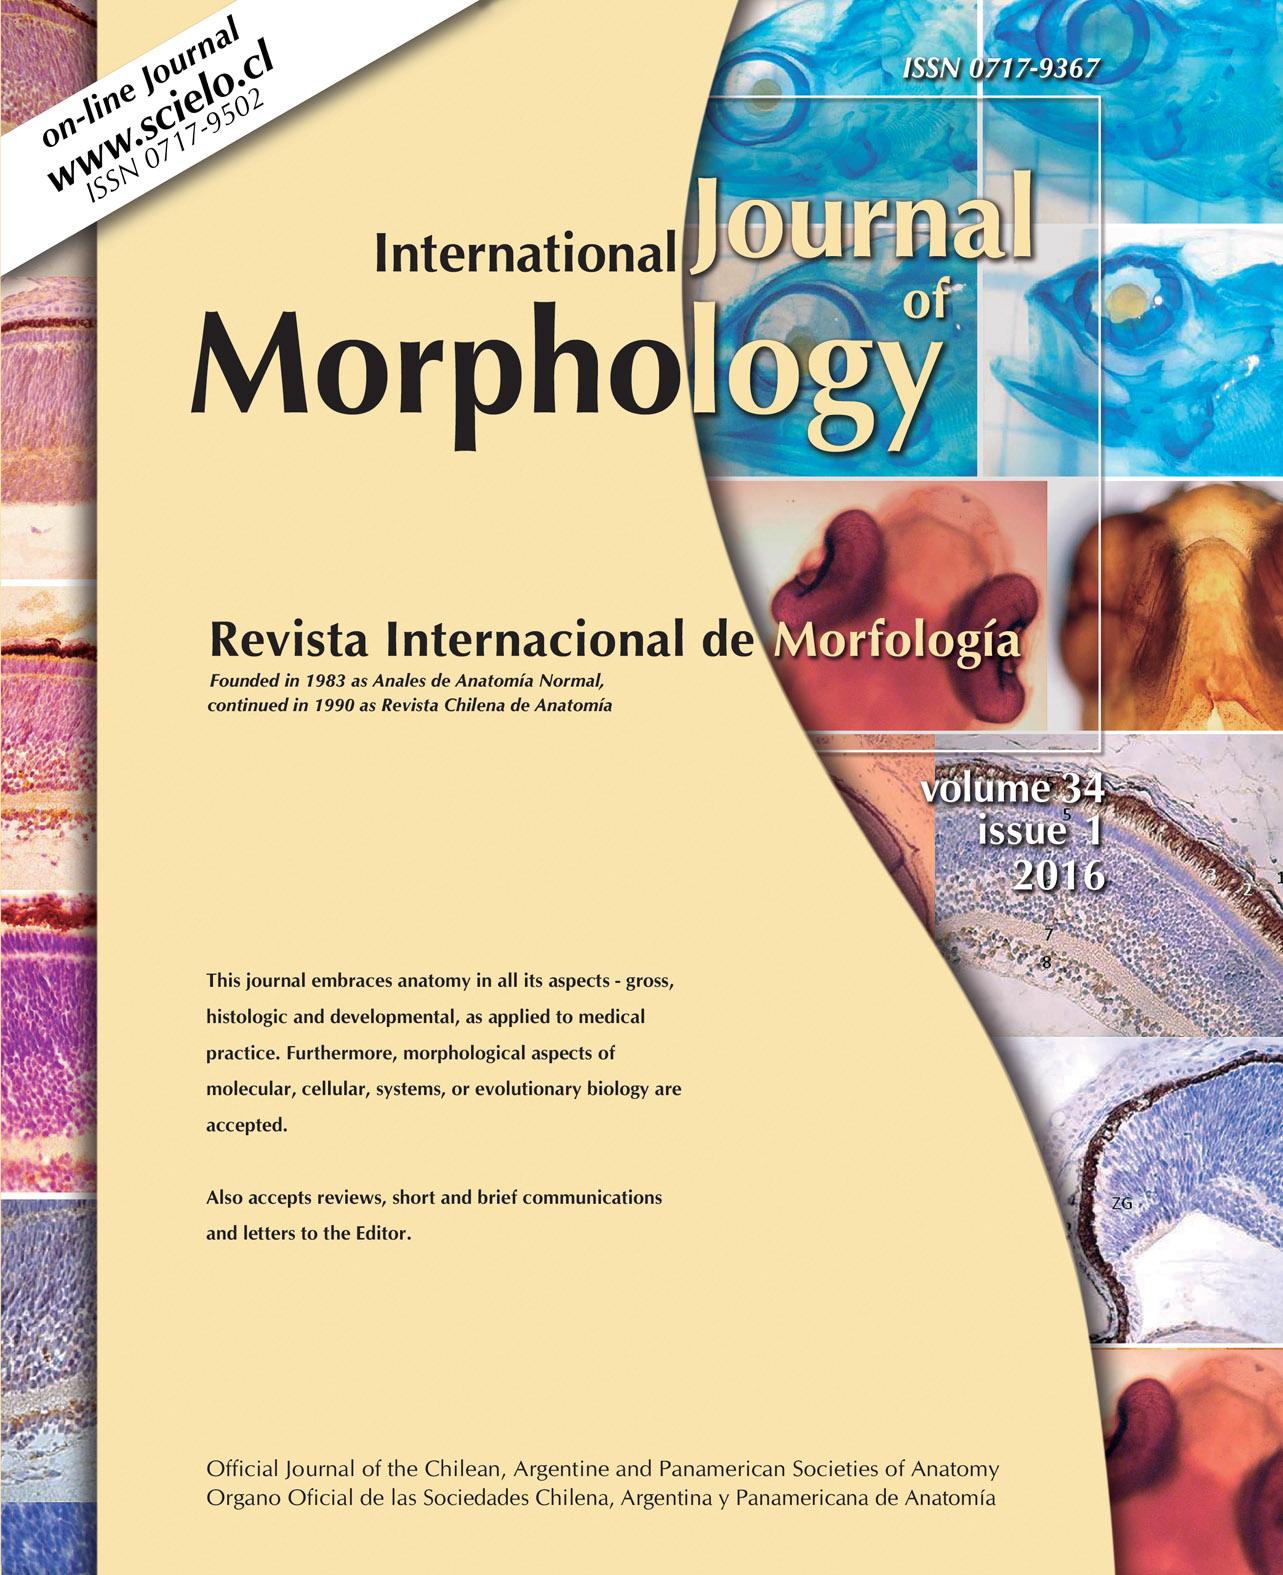 Ultimos Números Publicados - International Journal of Morphology